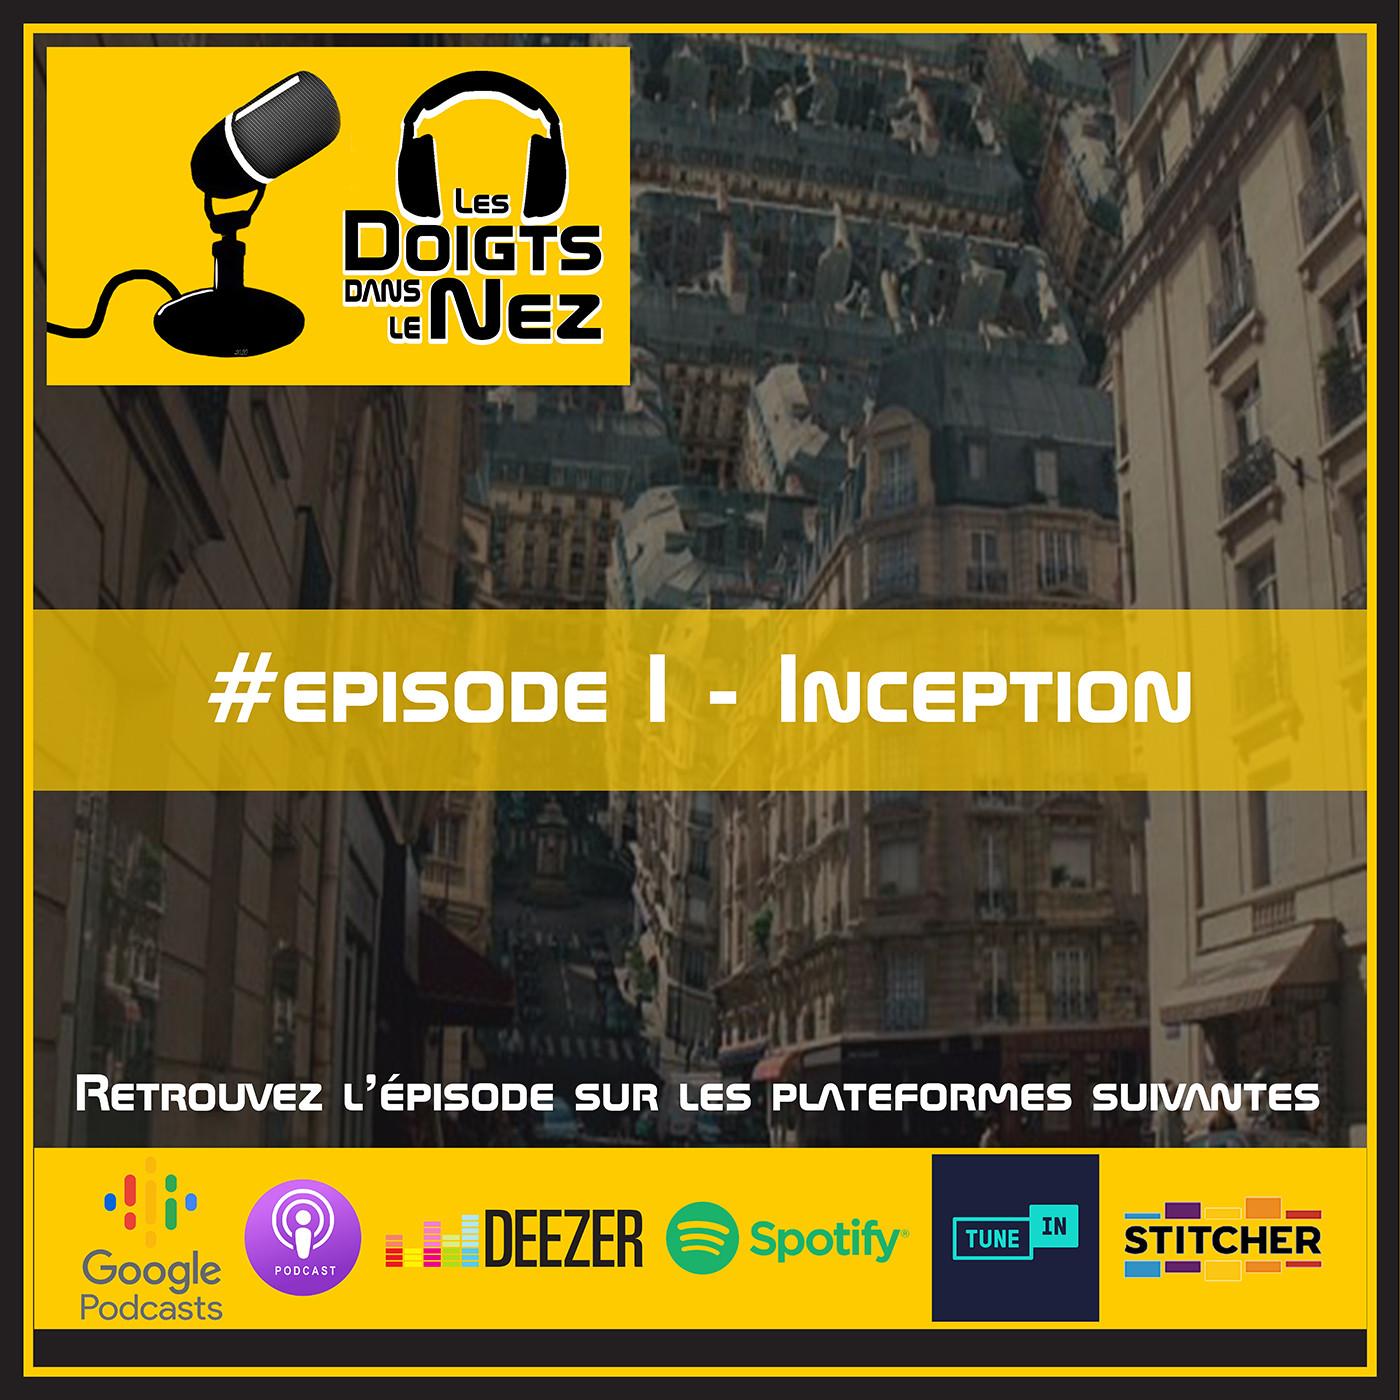 #Episode pilote - Inception